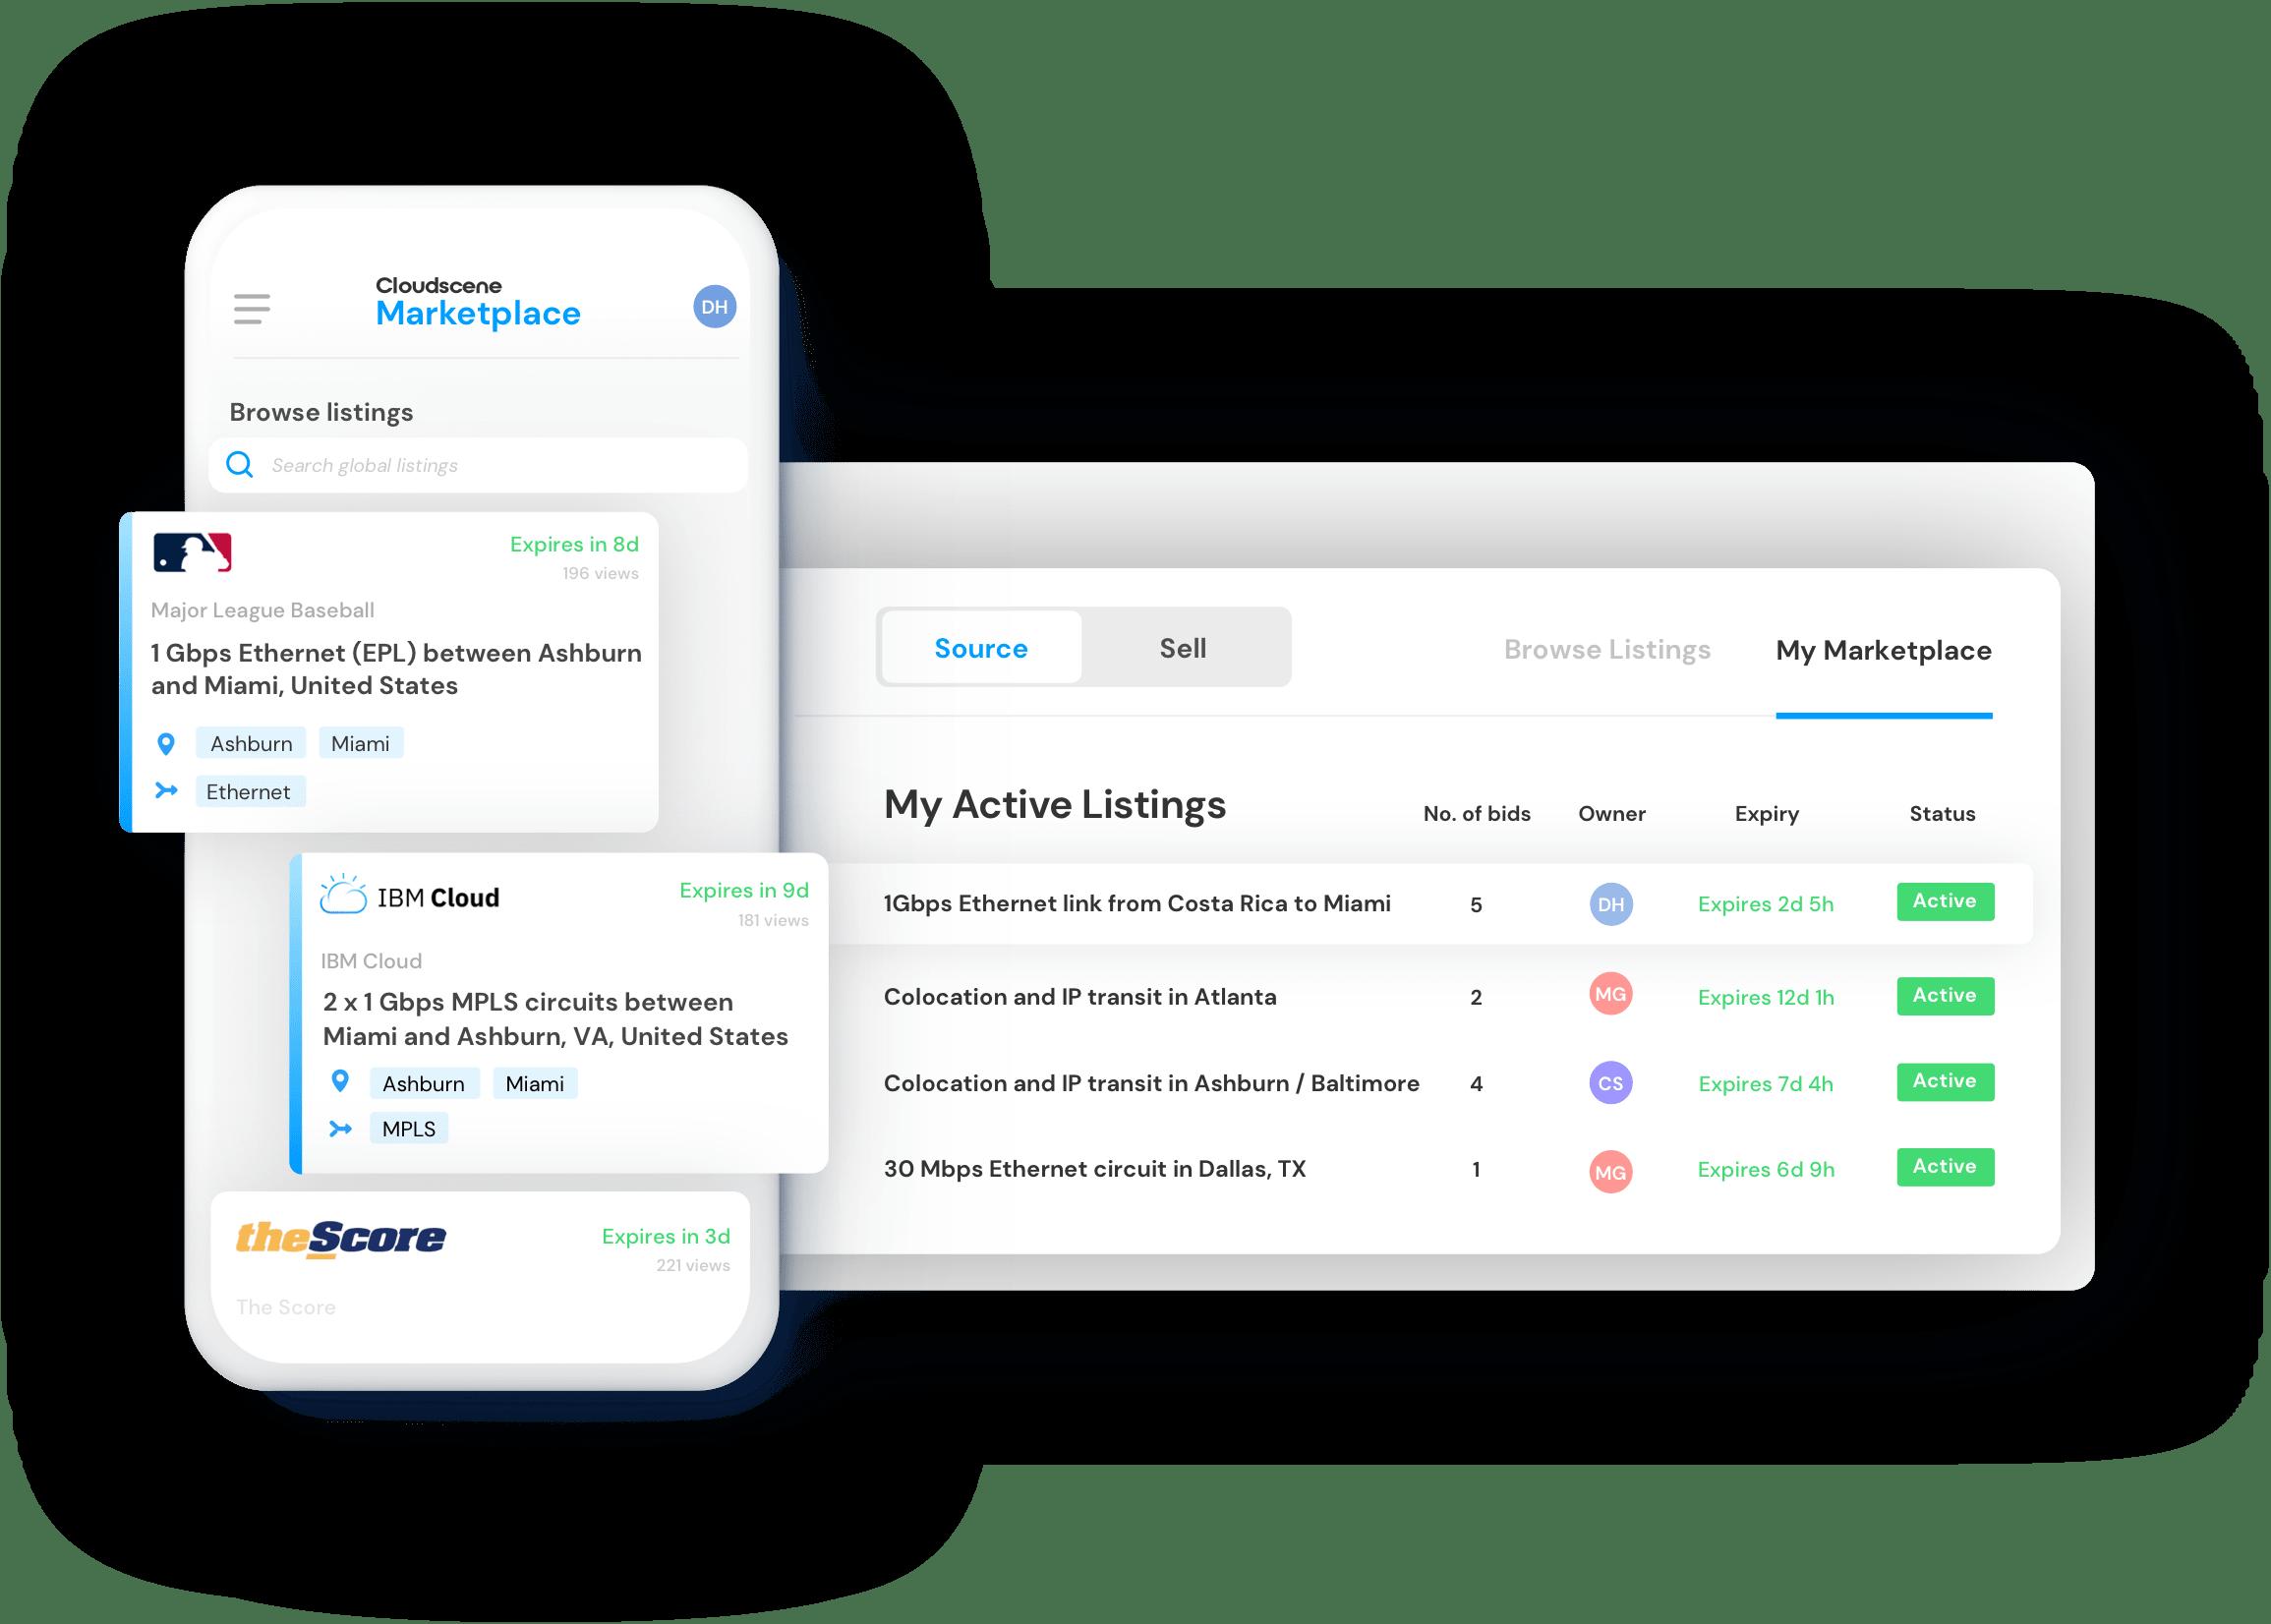 Screenshot showing Cloudscene's Marketplace listings